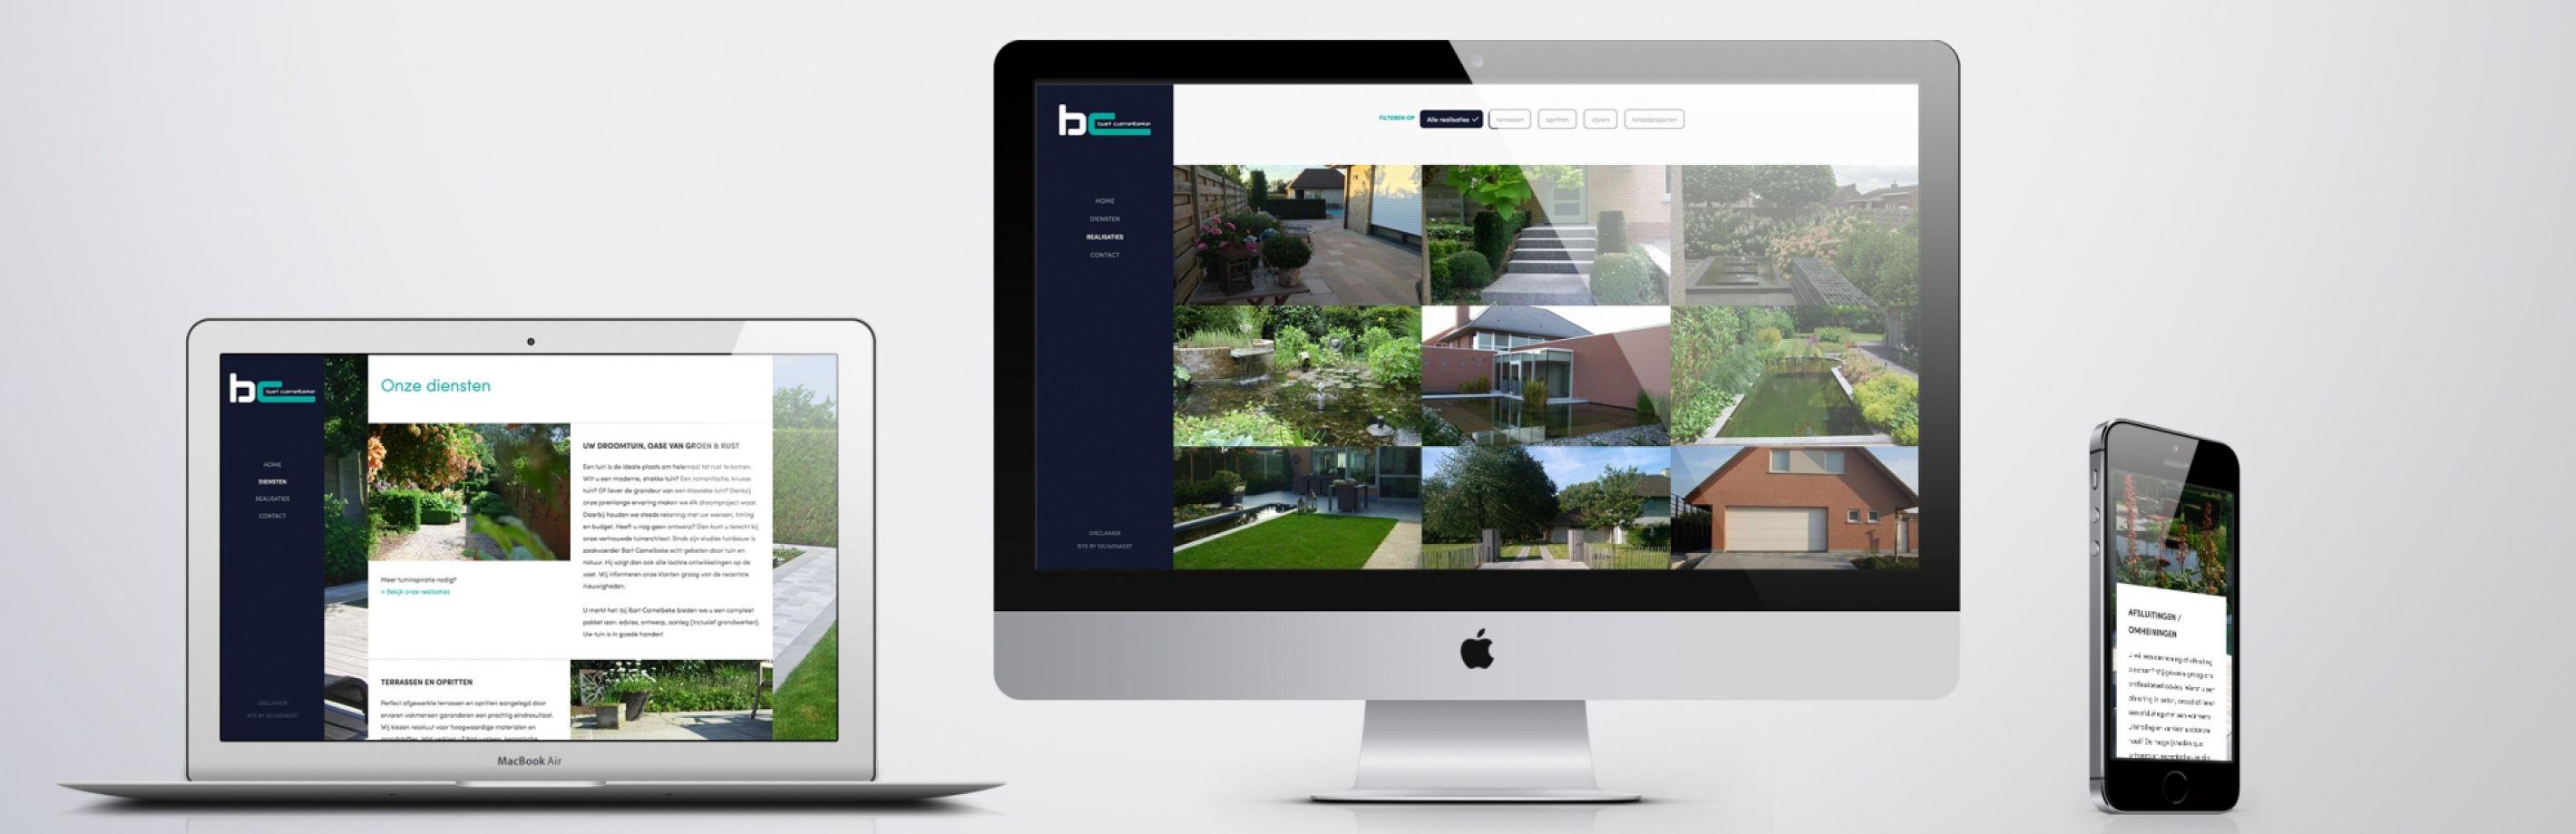 Bart Camelbeke website van laptop tot dekstop tot smartphone